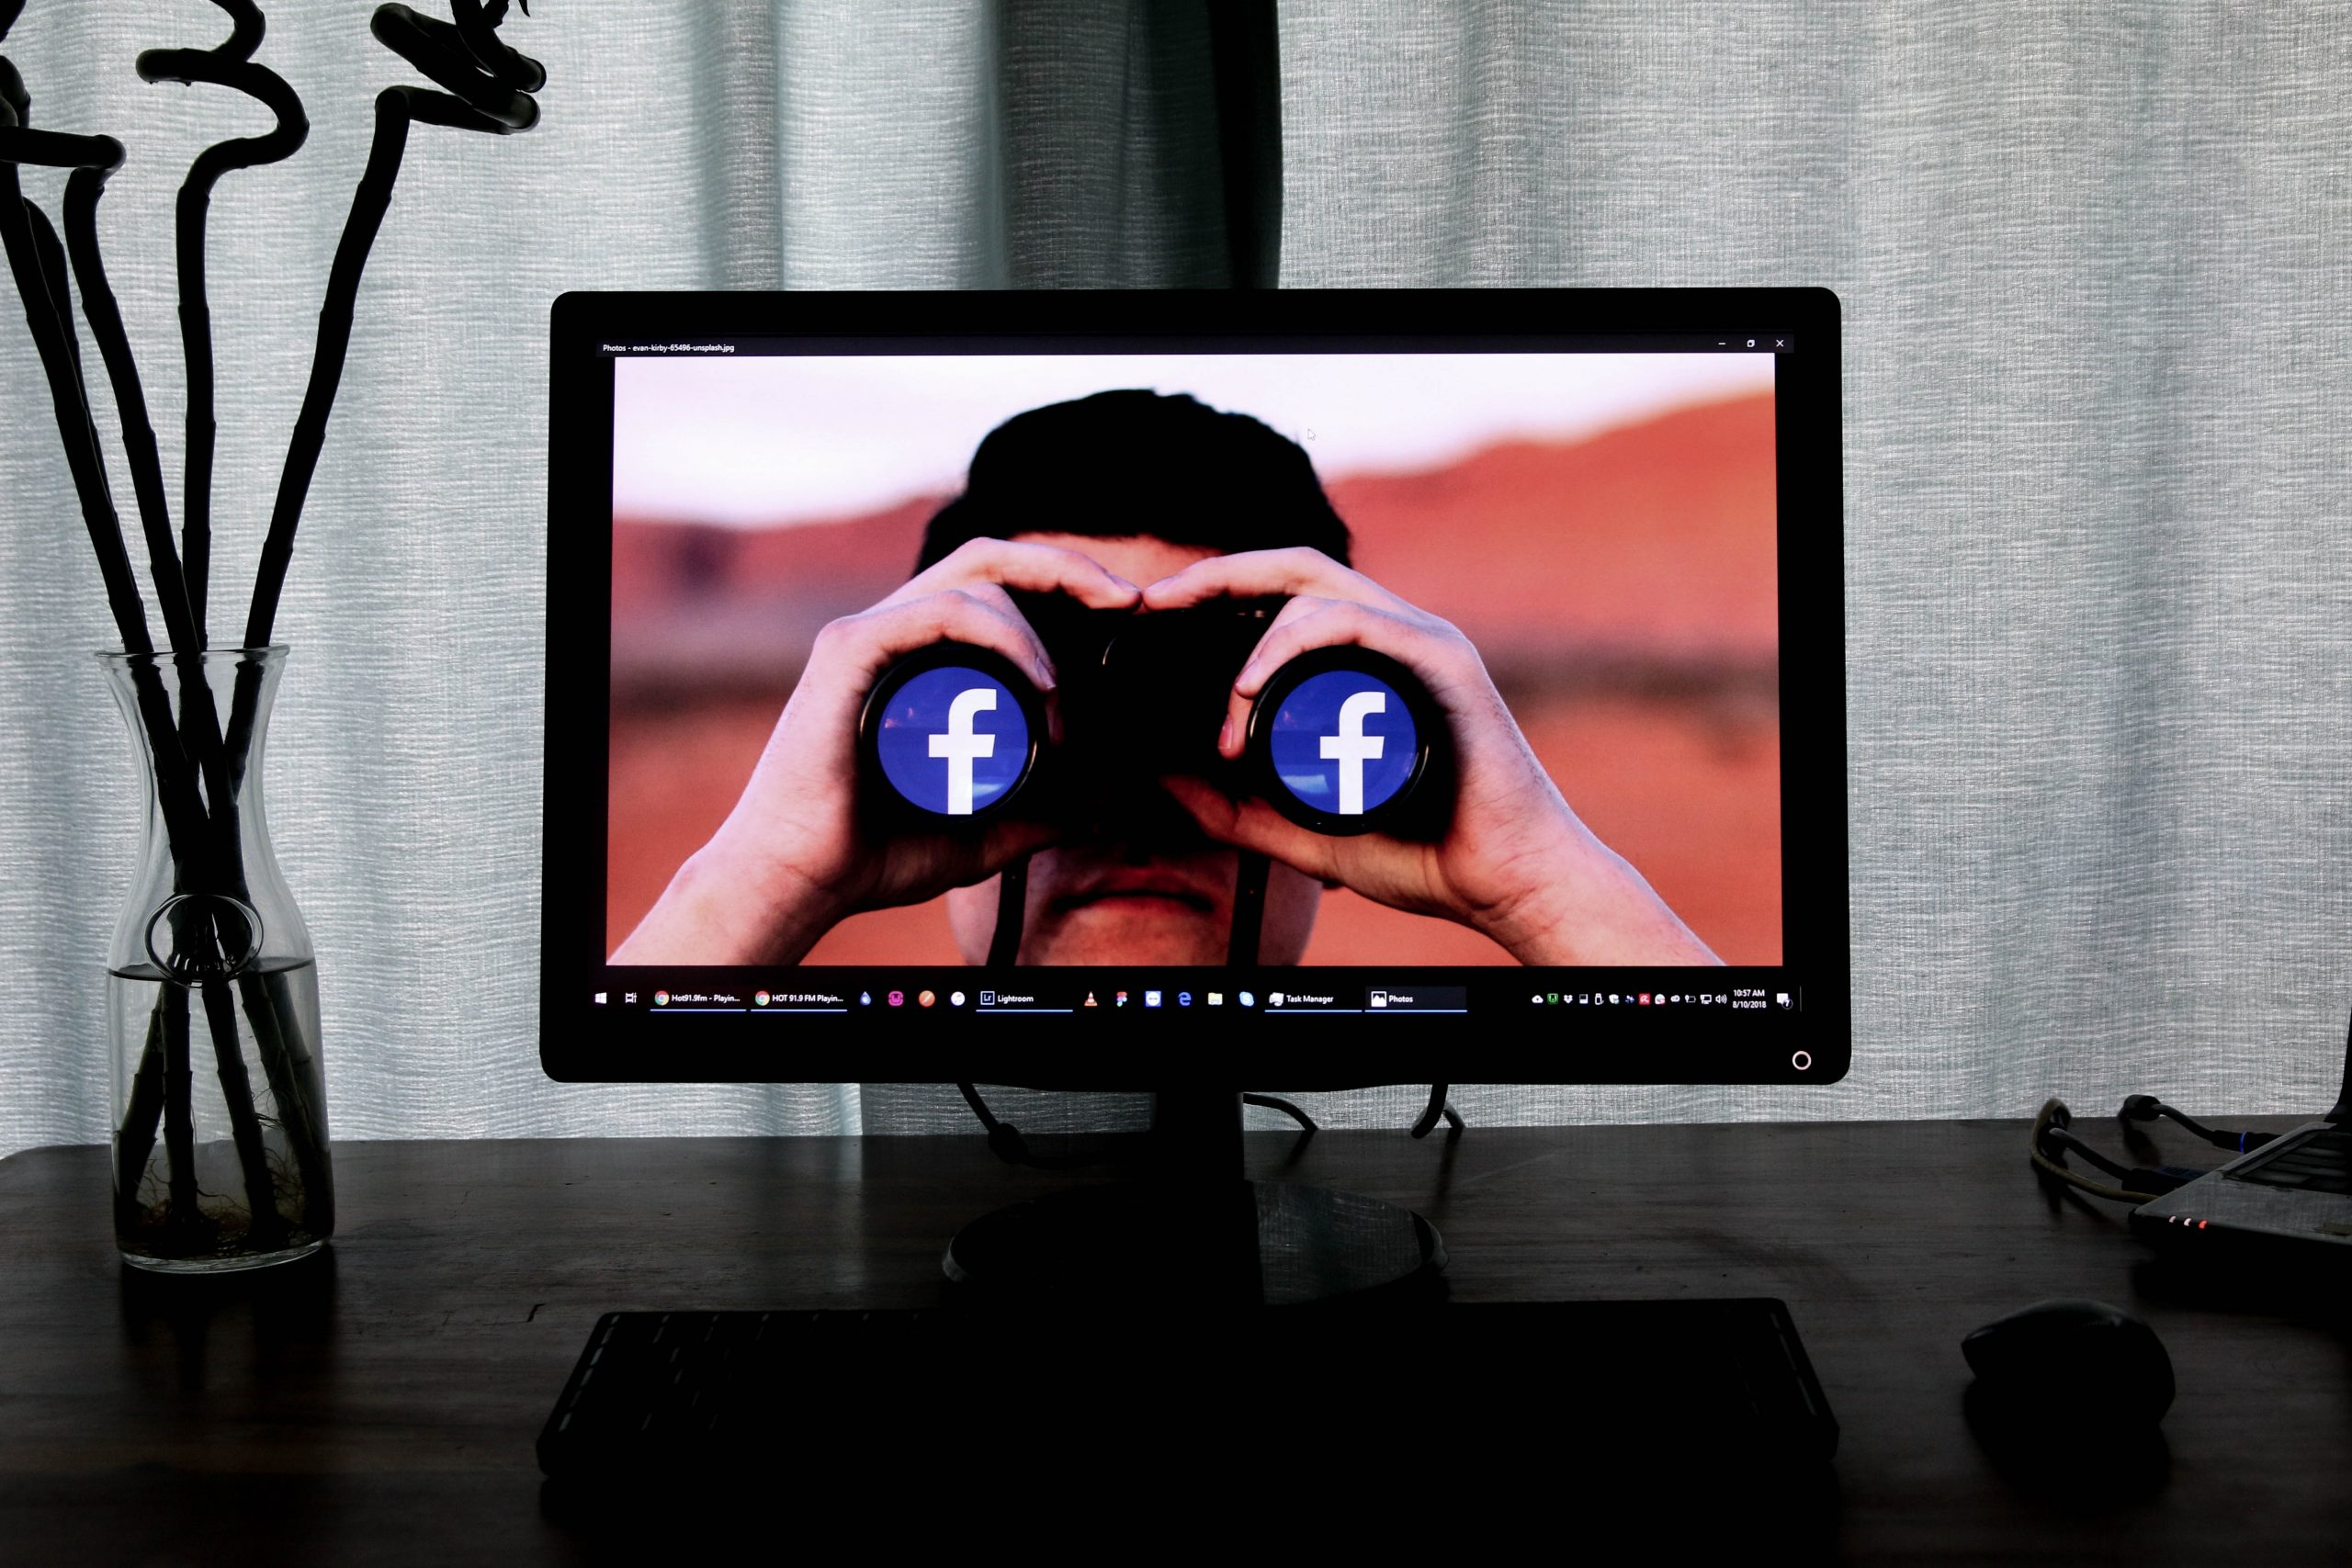 Le tendenze Facebook da conoscere nel 2021